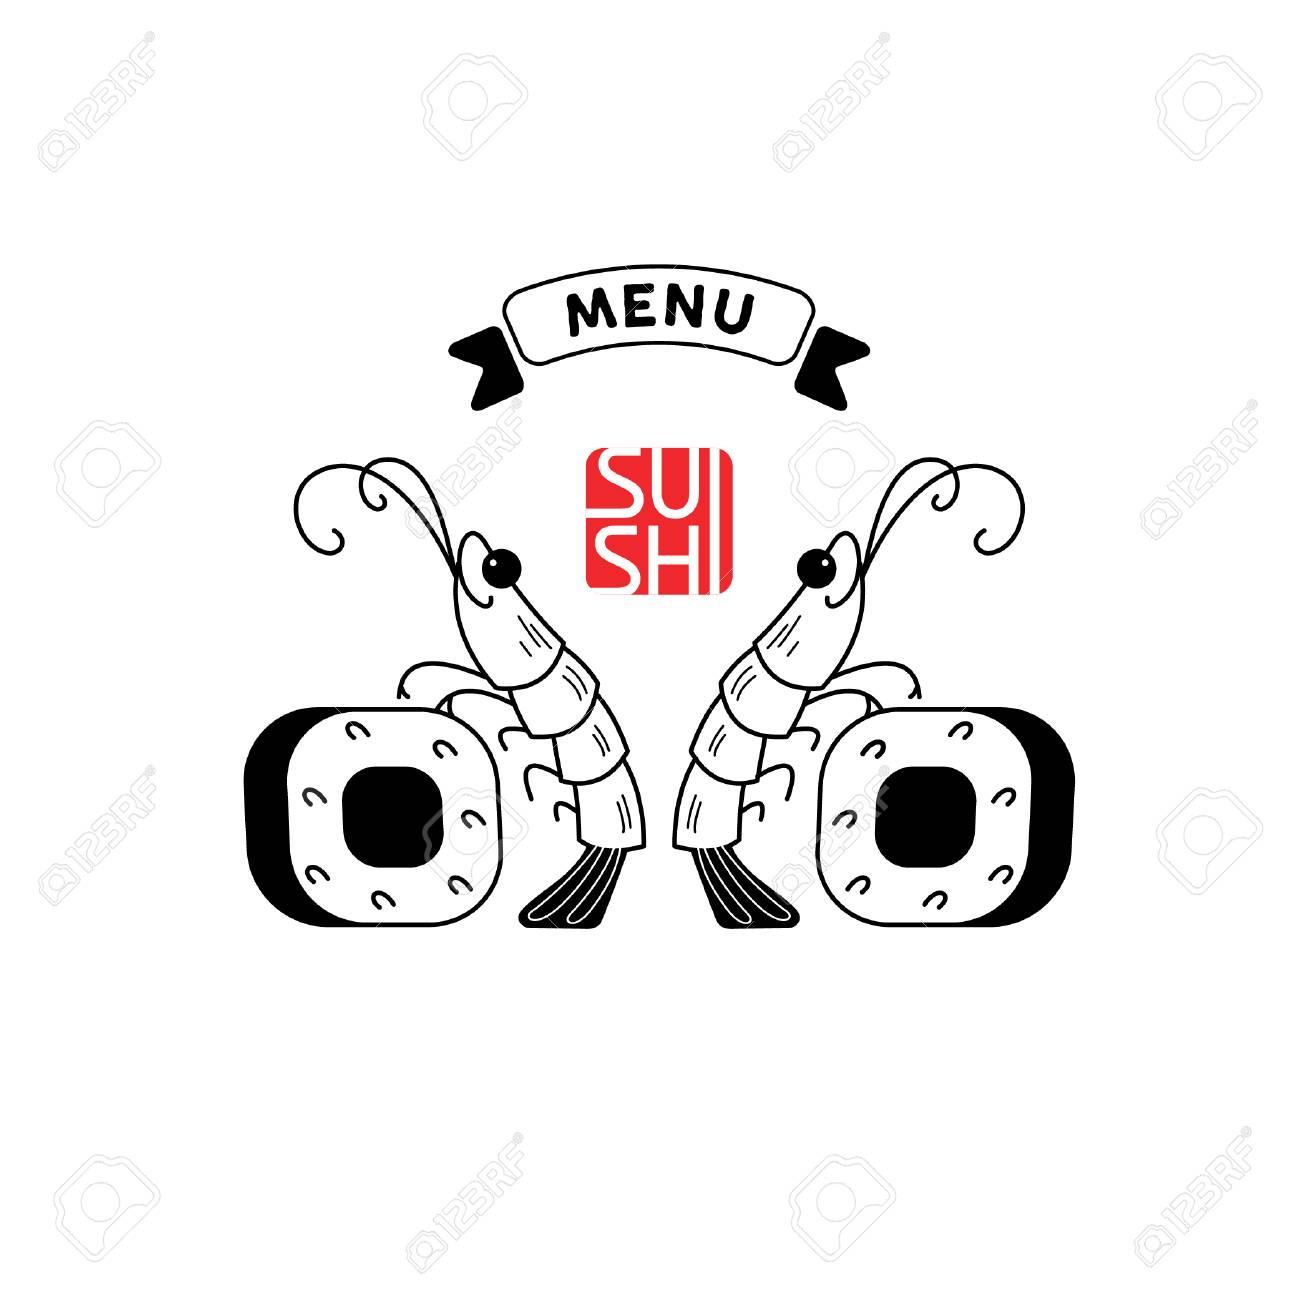 logo shrimp sushi shrimp and sushi vector illustration sign rh 123rf com shrimp logo restaurant shrimp logo psd